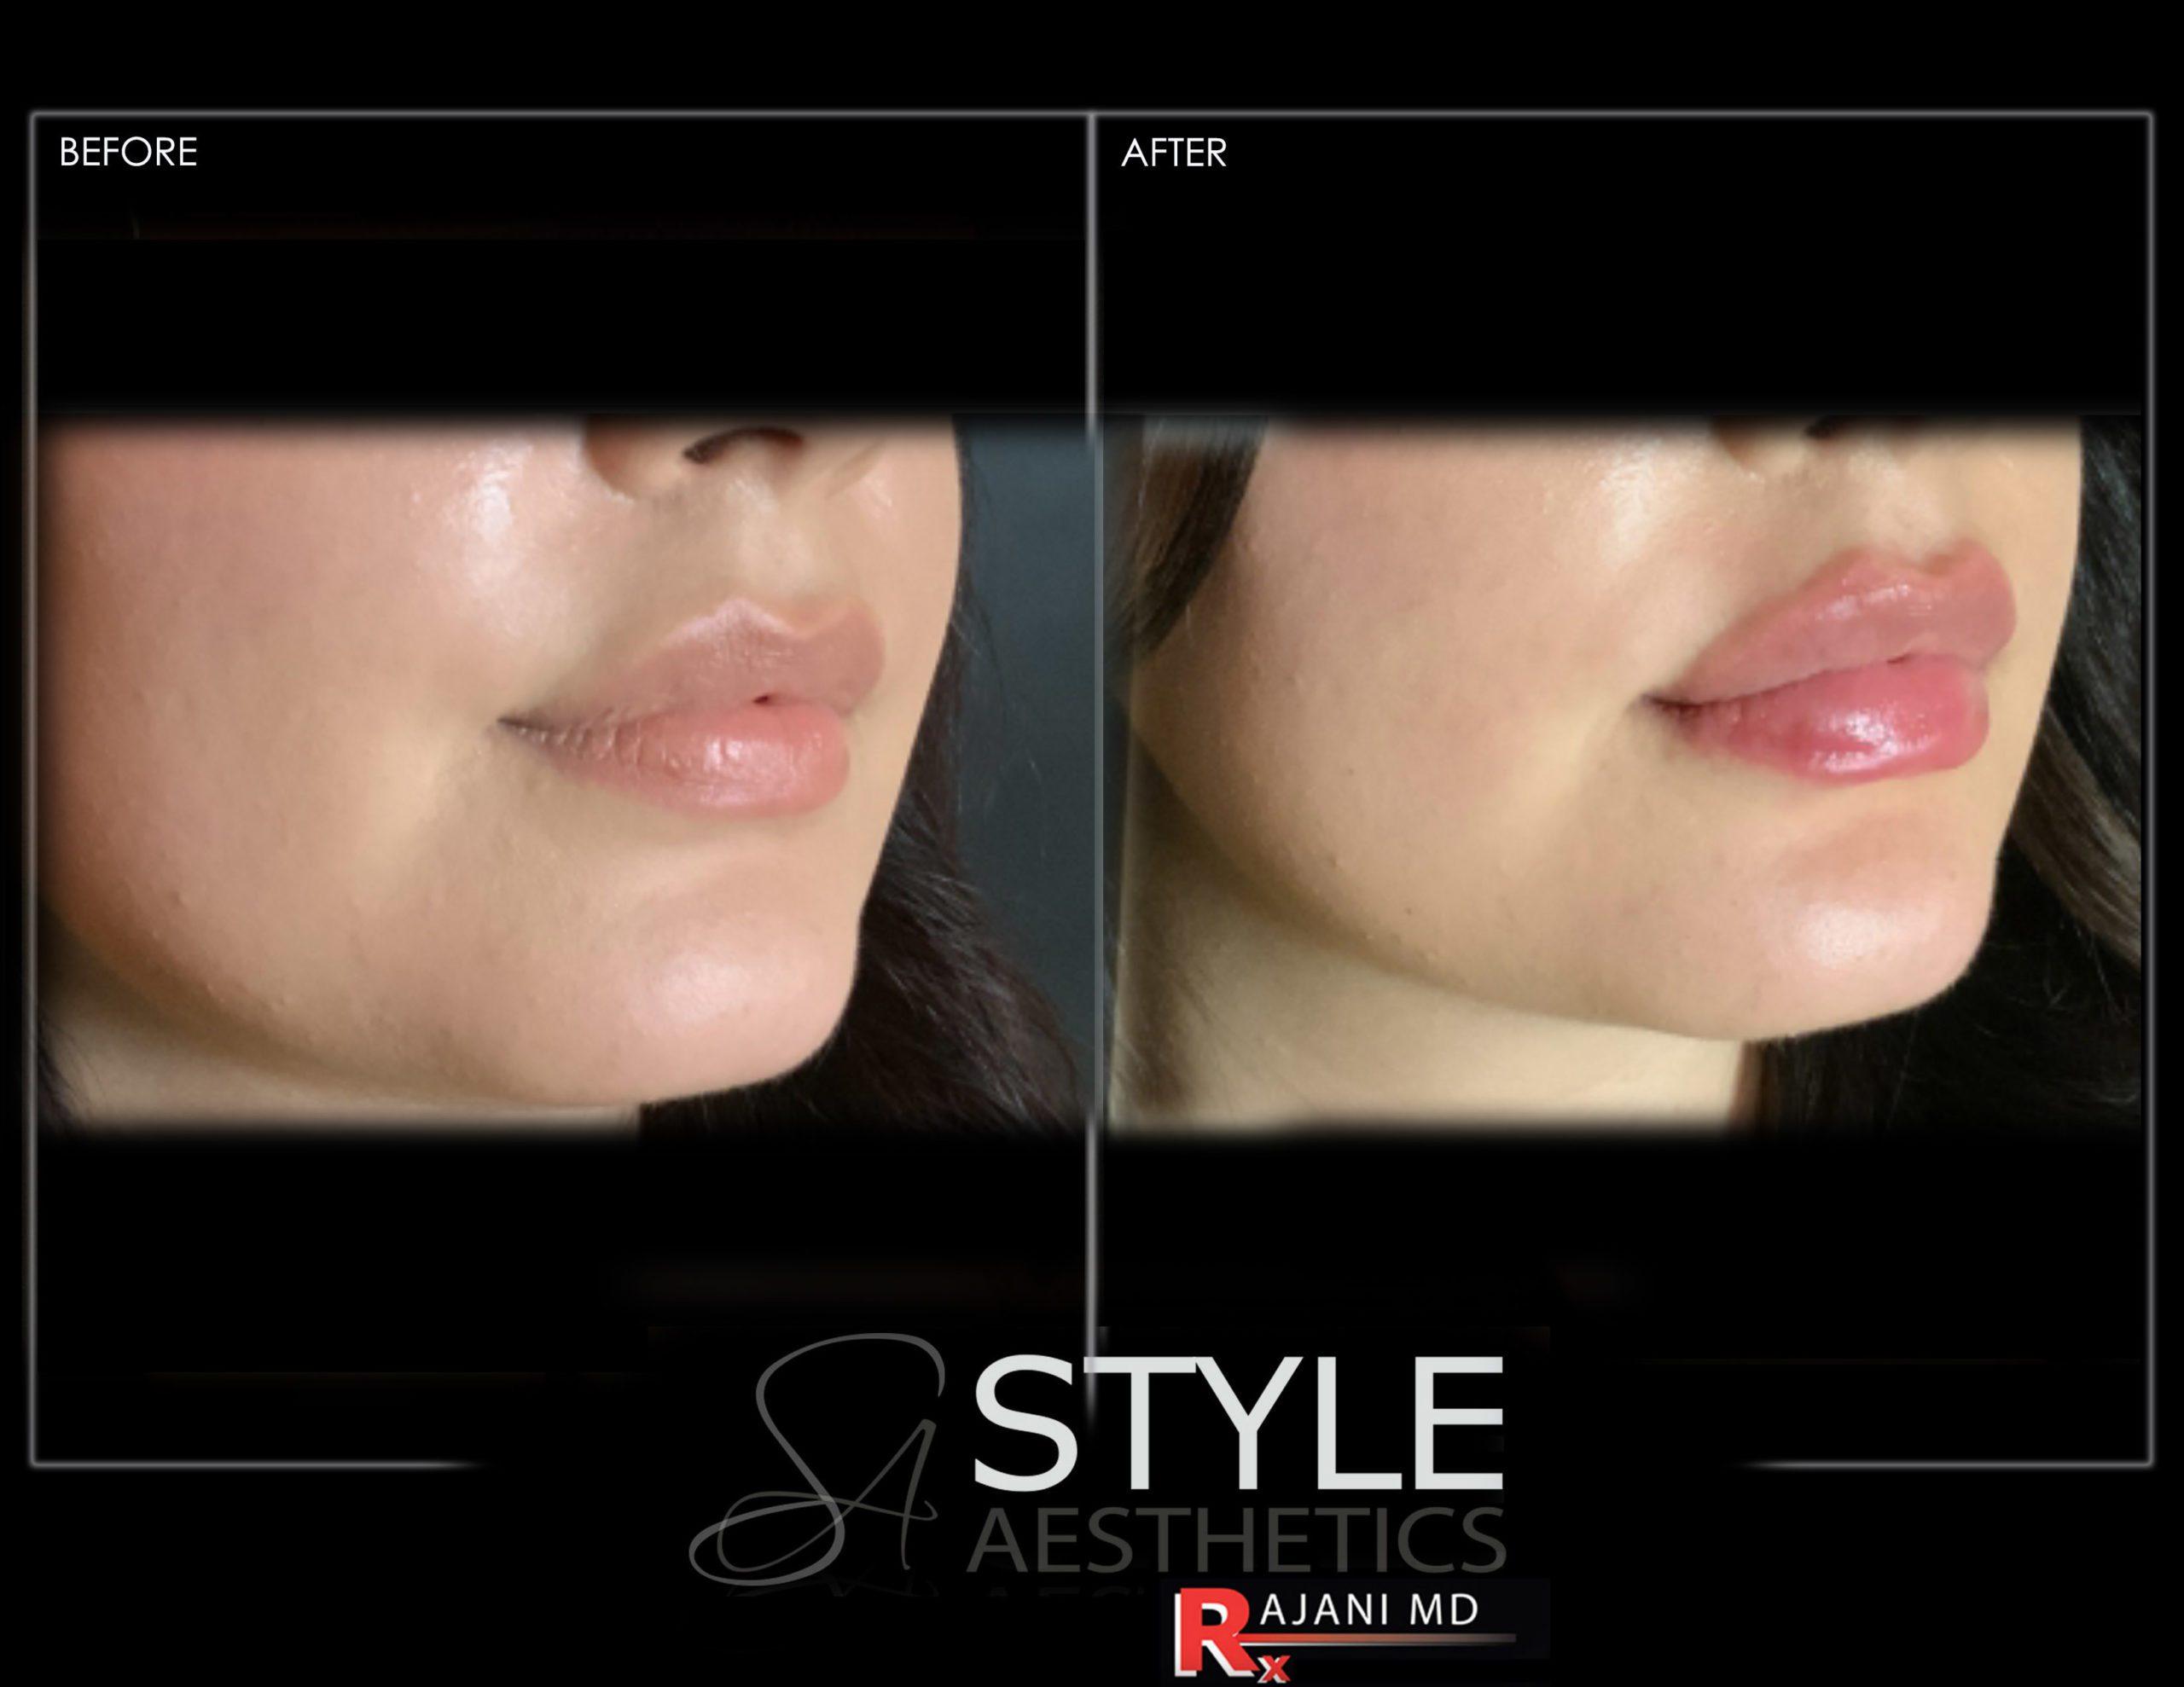 Lip Procedures and Enhancements by RajaniMD